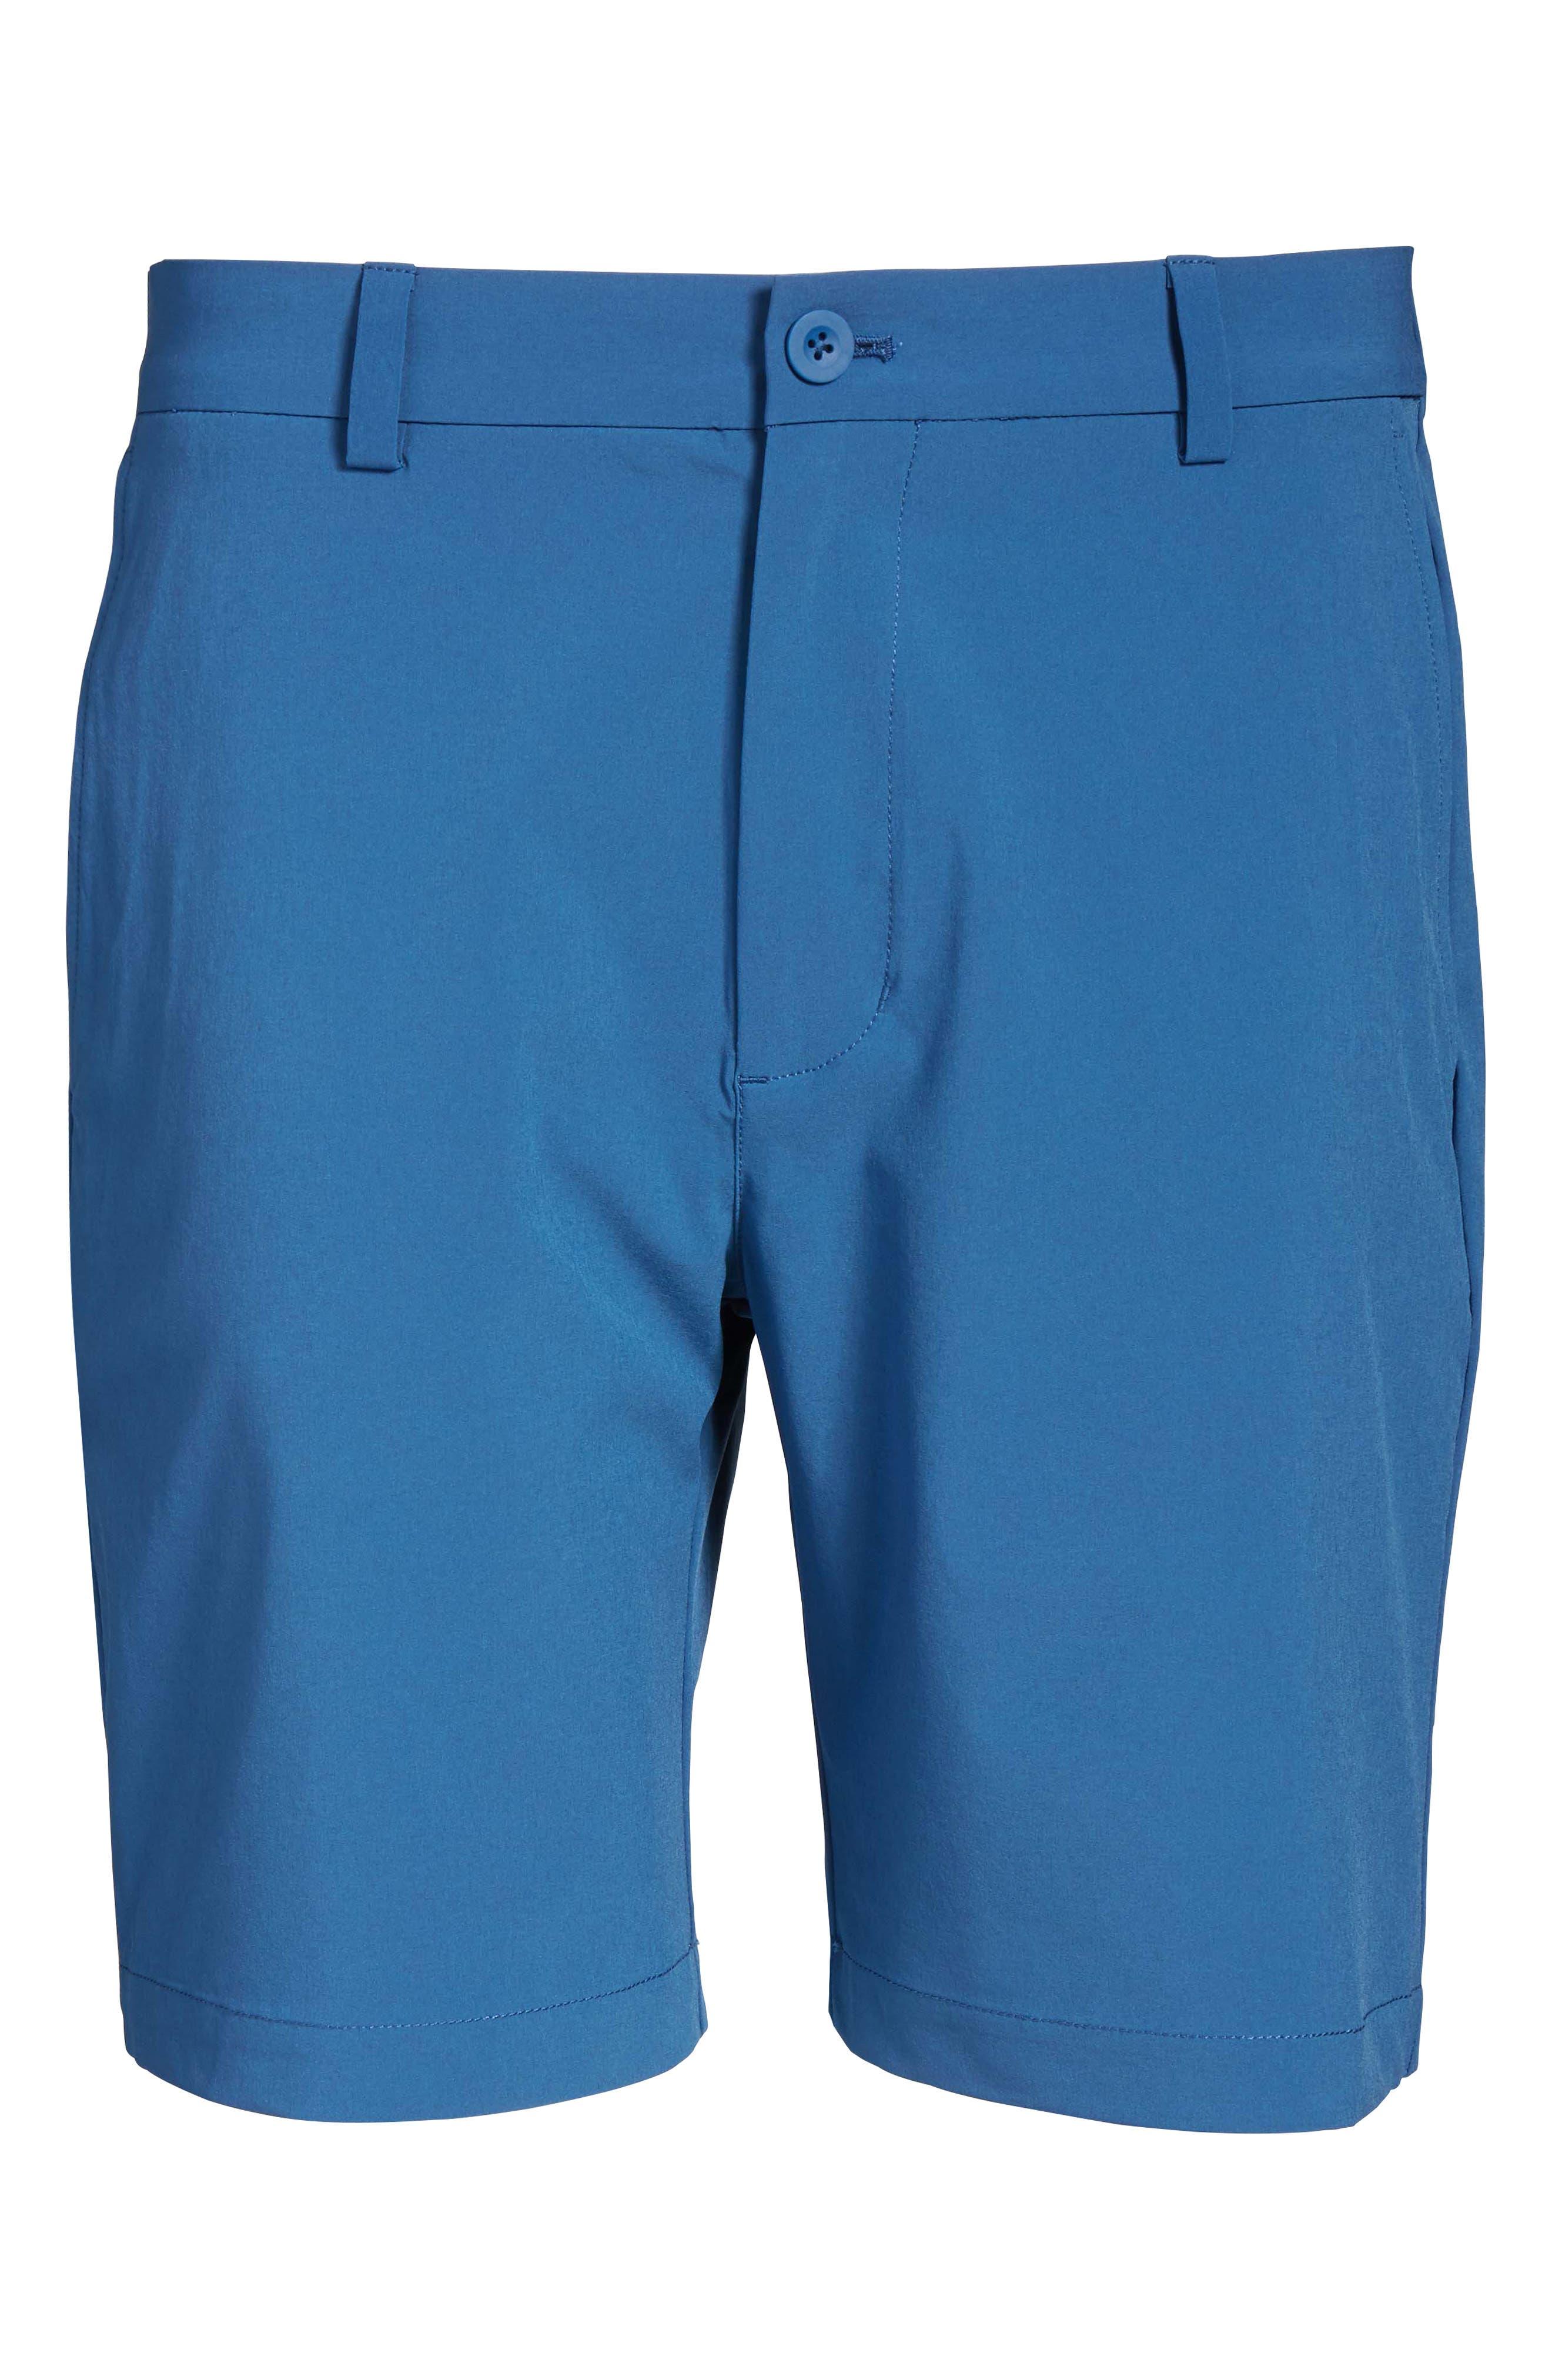 8 Inch Performance Breaker Shorts,                             Alternate thumbnail 77, color,